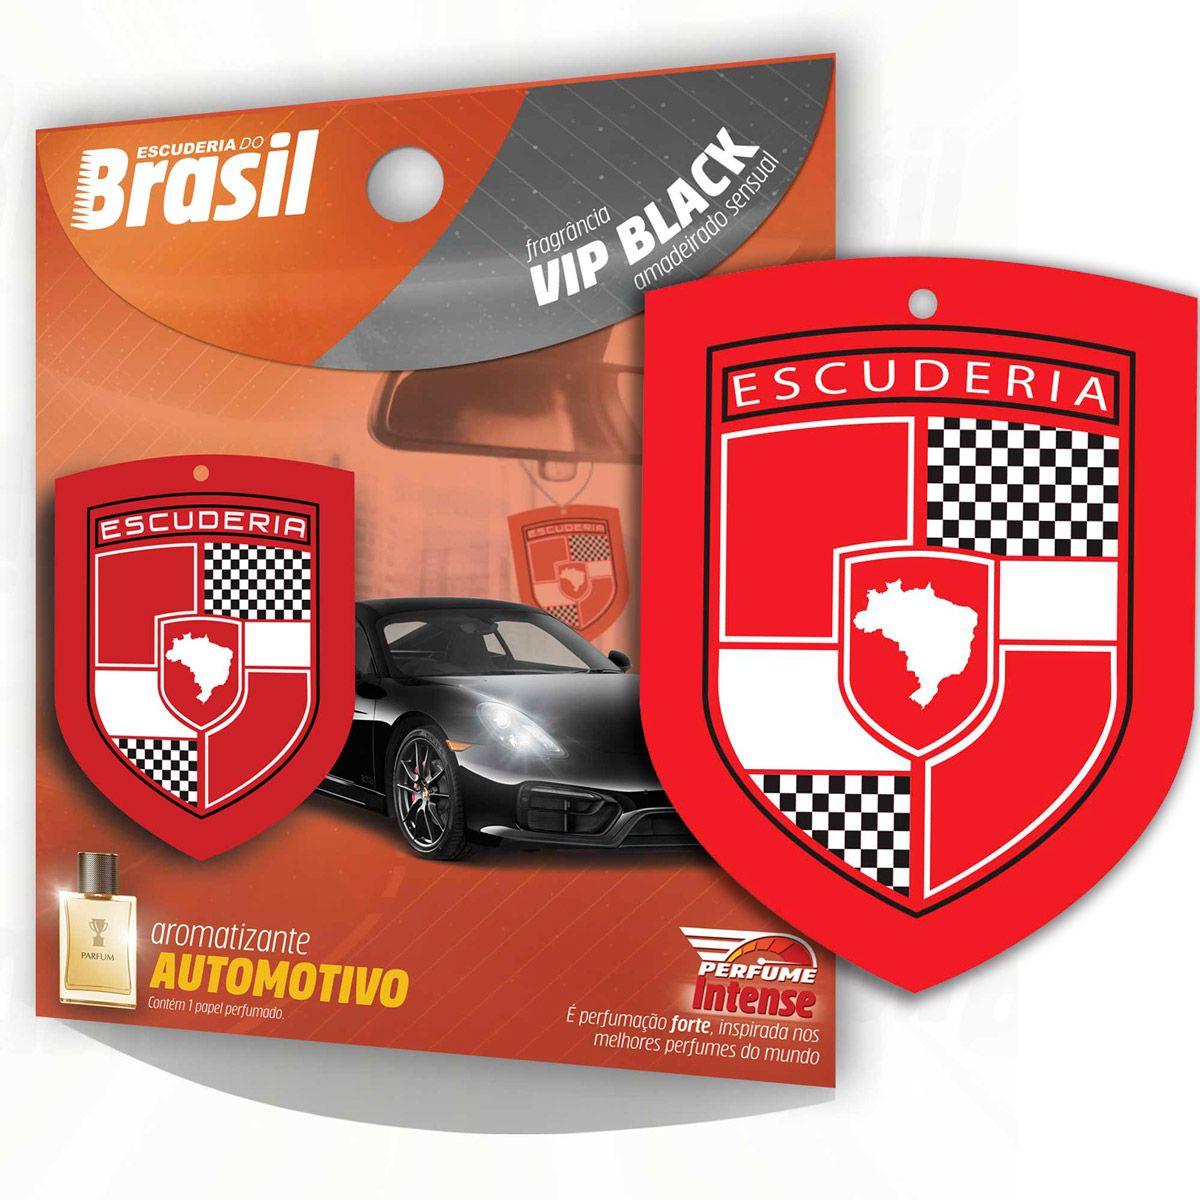 Aromatizante Automotivo Escuderia Brasil - Vip Black